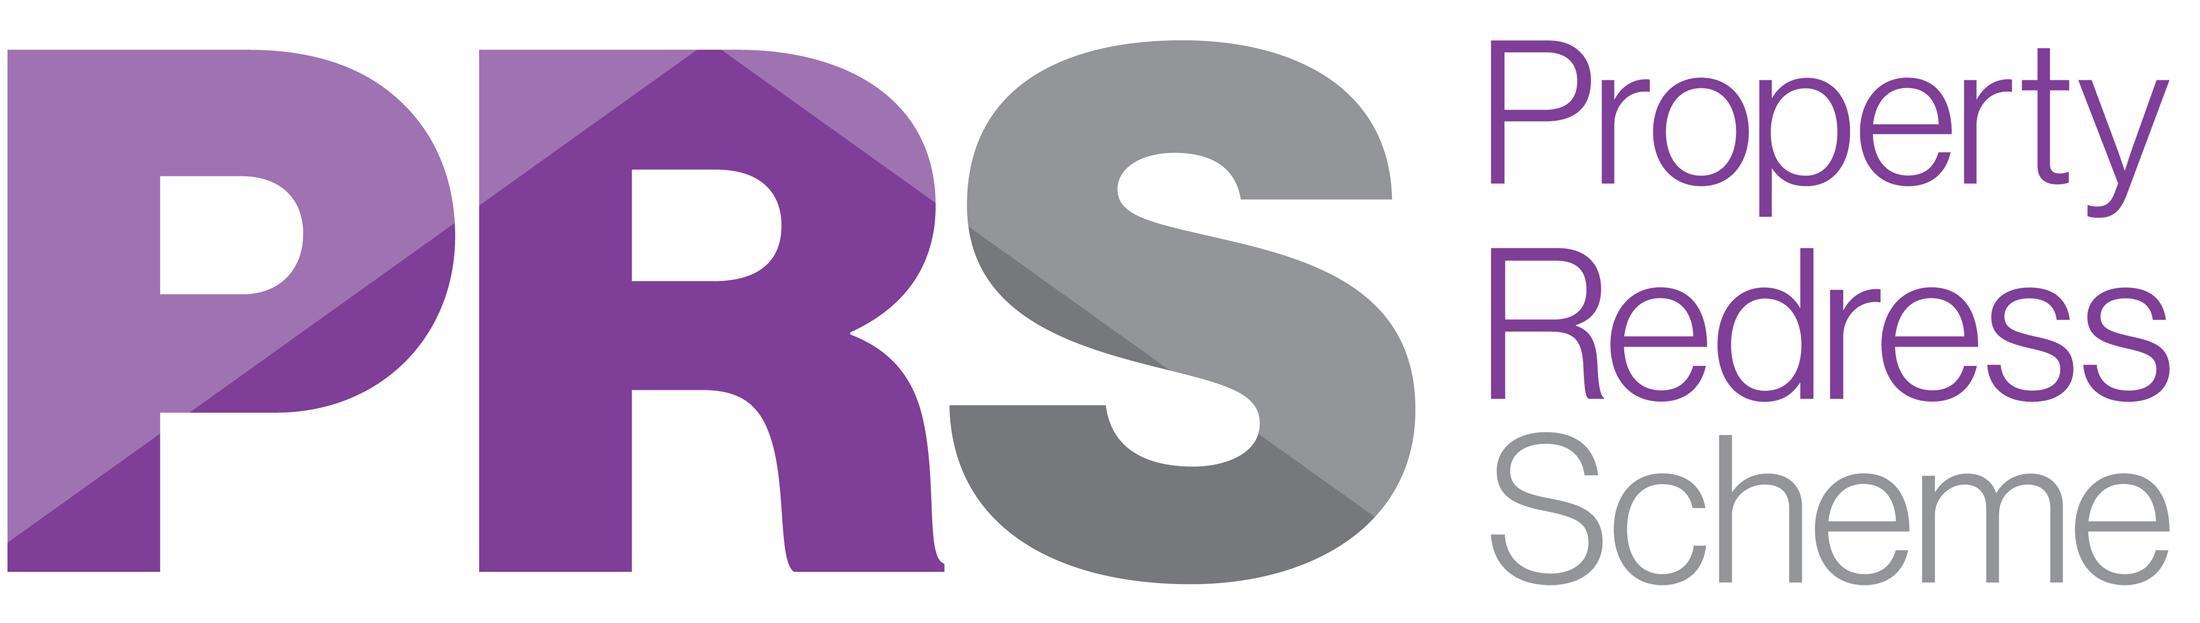 PRS_Logo_medium.jpg